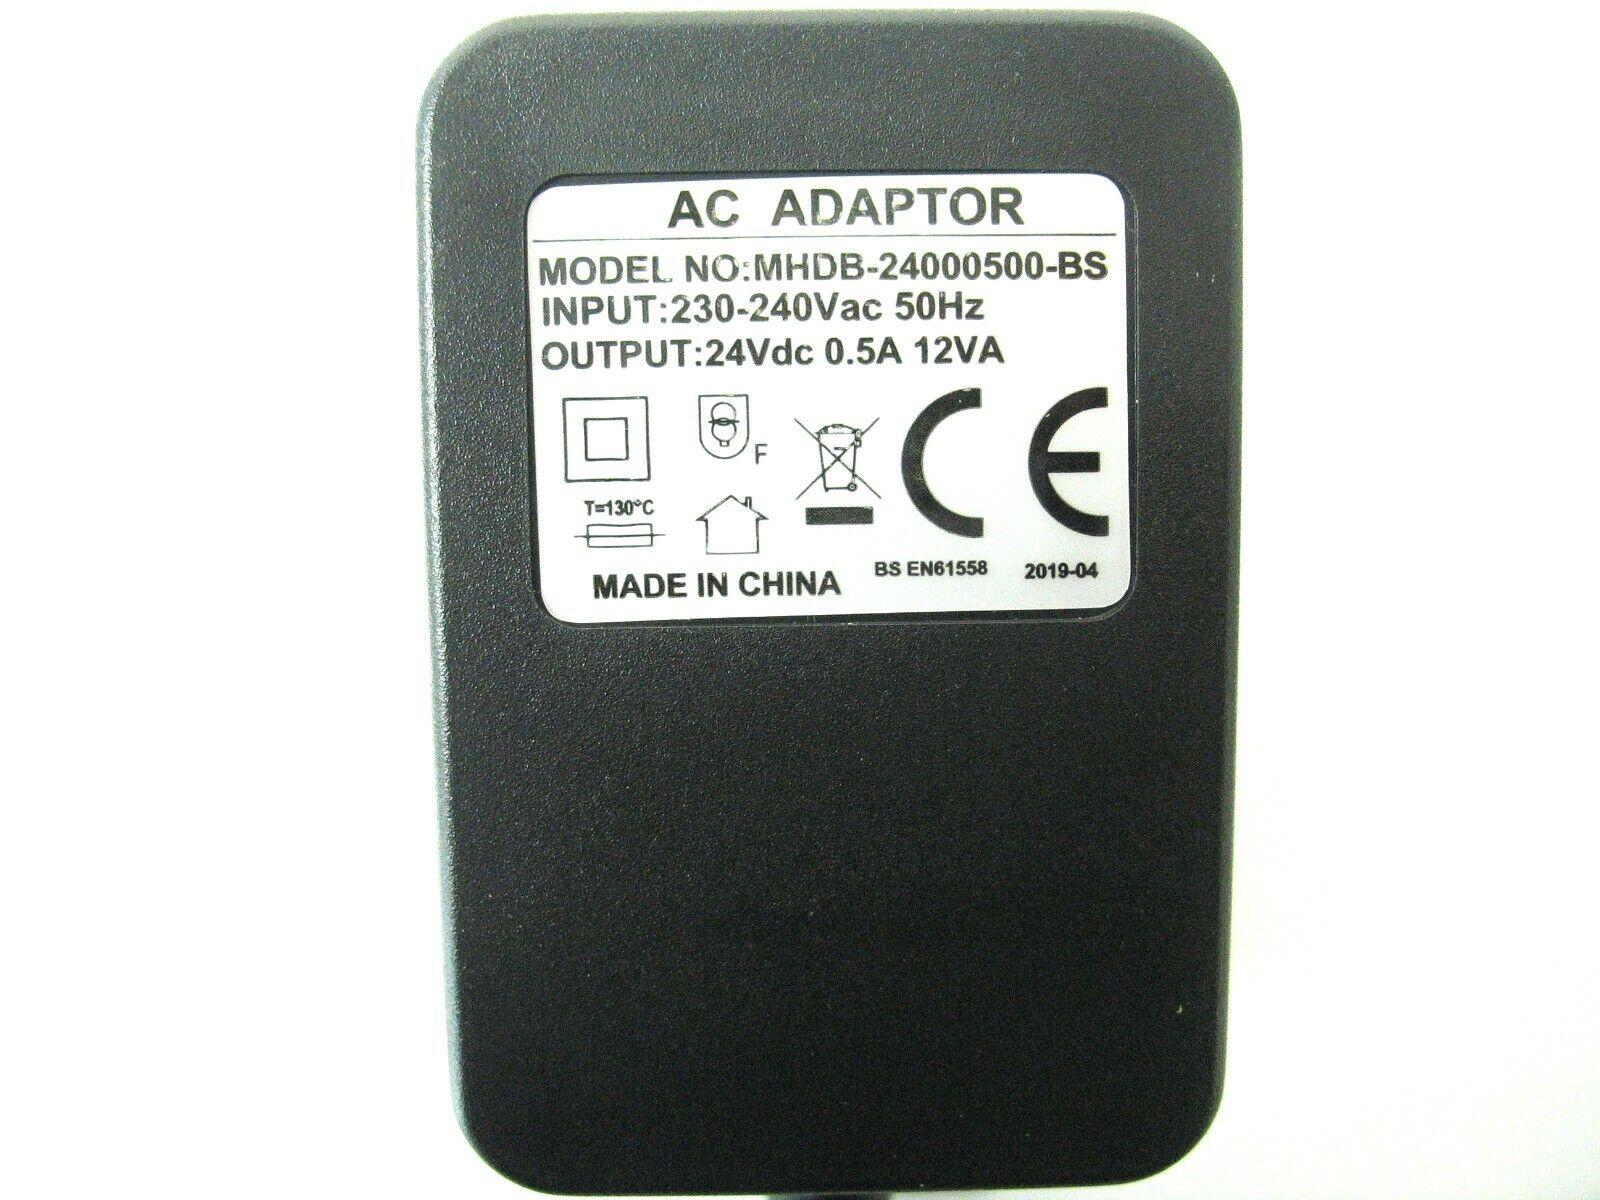 500ma 24v Socket AC-DC (DC Output) Power Adaptor/Supply/Charger 0.5a 12w 12va